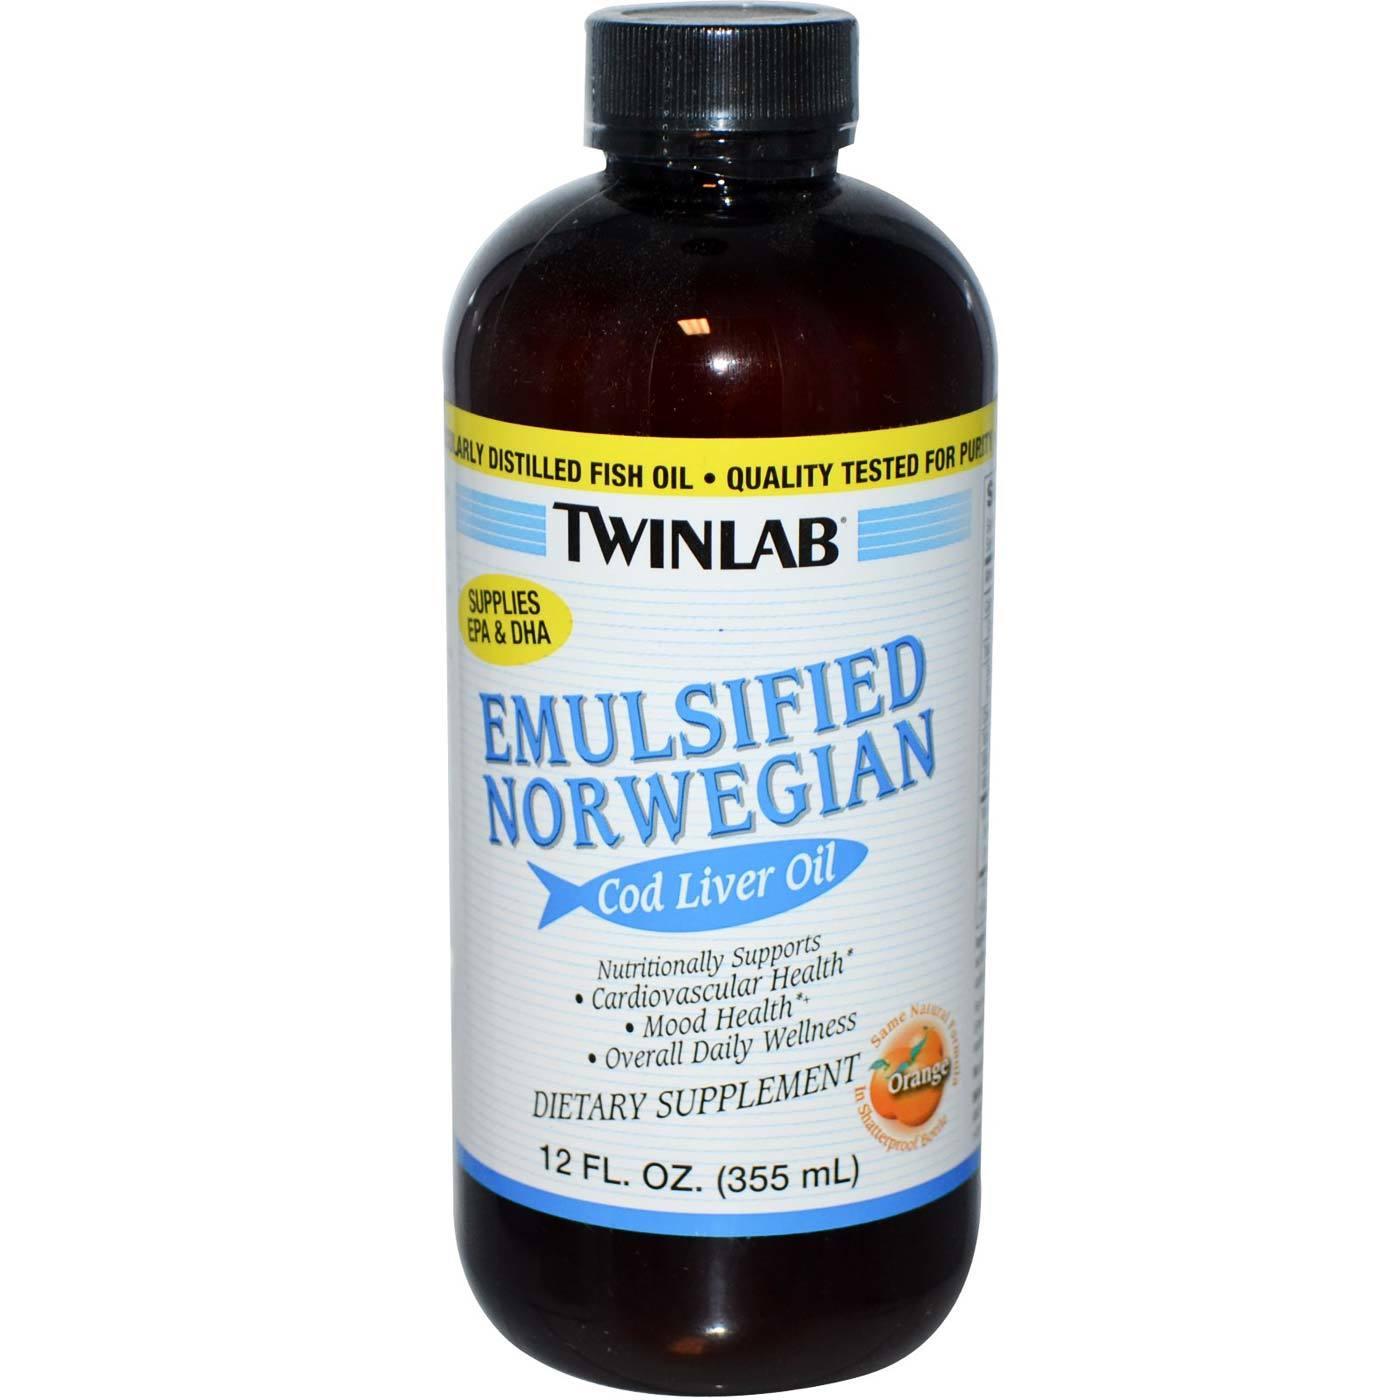 Twinlab Emulsified Cod Liver Oil Orange 12 Fl Oz Nordic Arctic Softgels Lemon Hover To Zoom